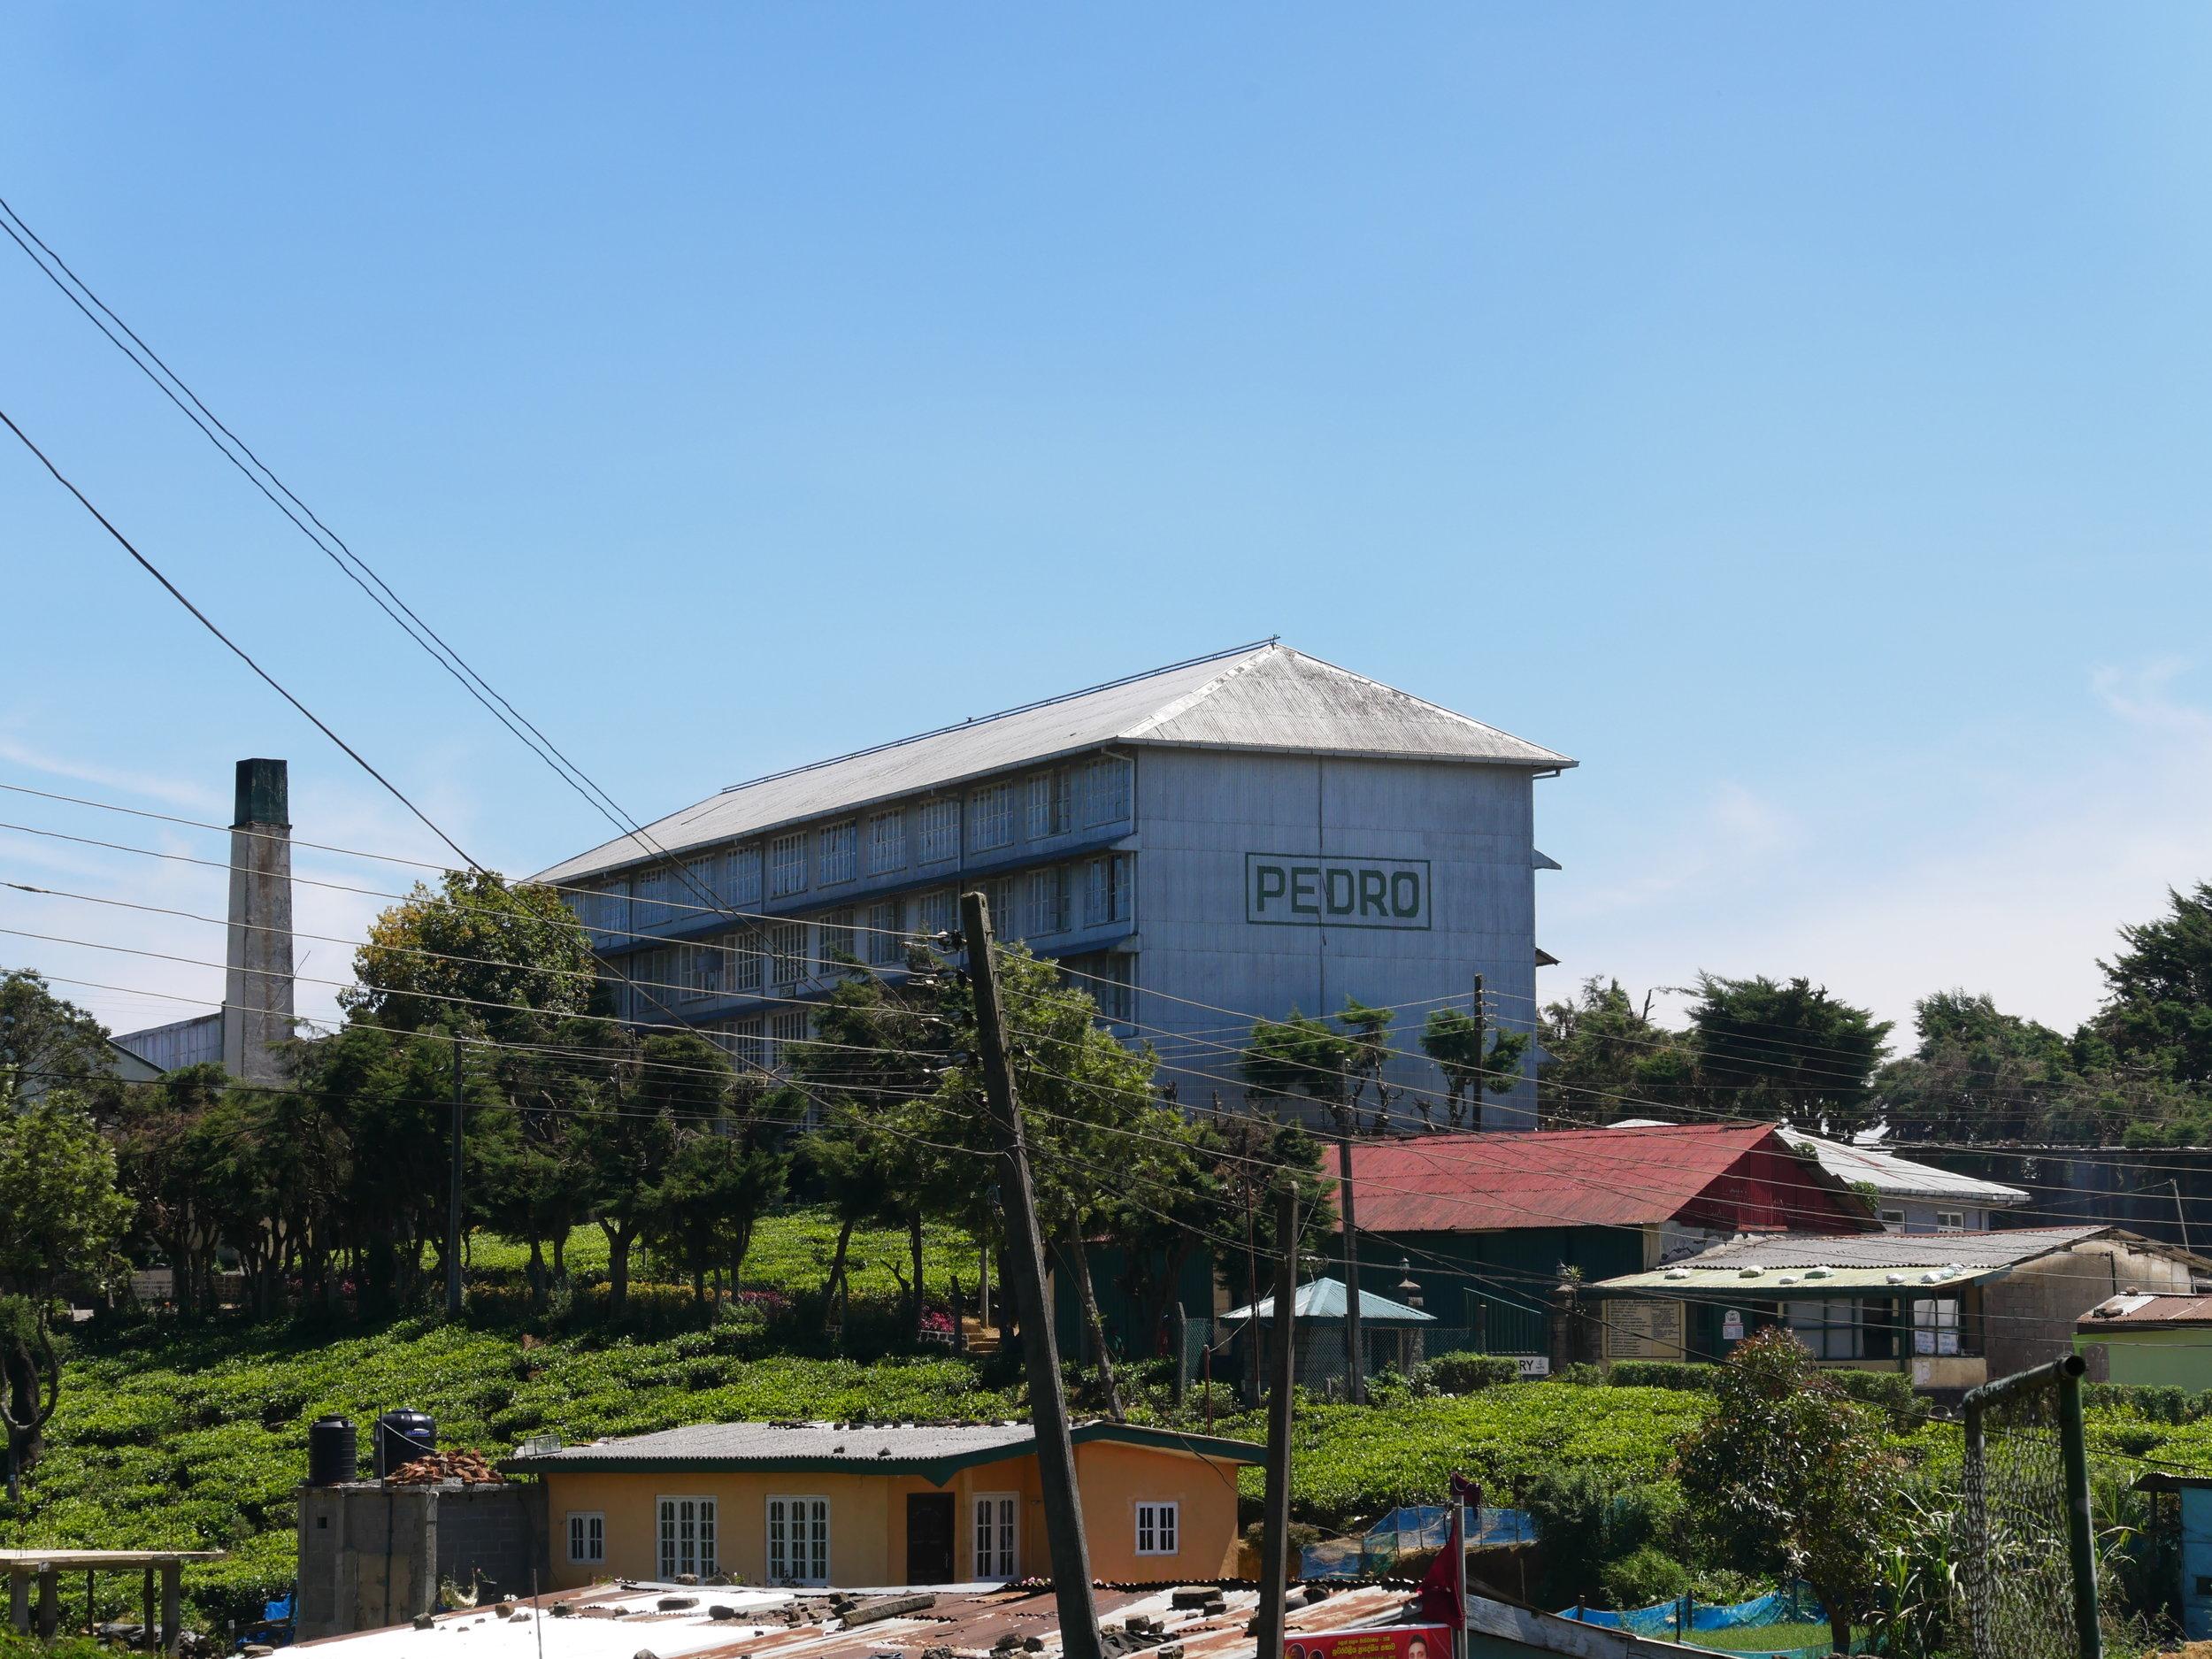 Pedro Tea Plantation, Nuwara Eliya, Sri Lanka